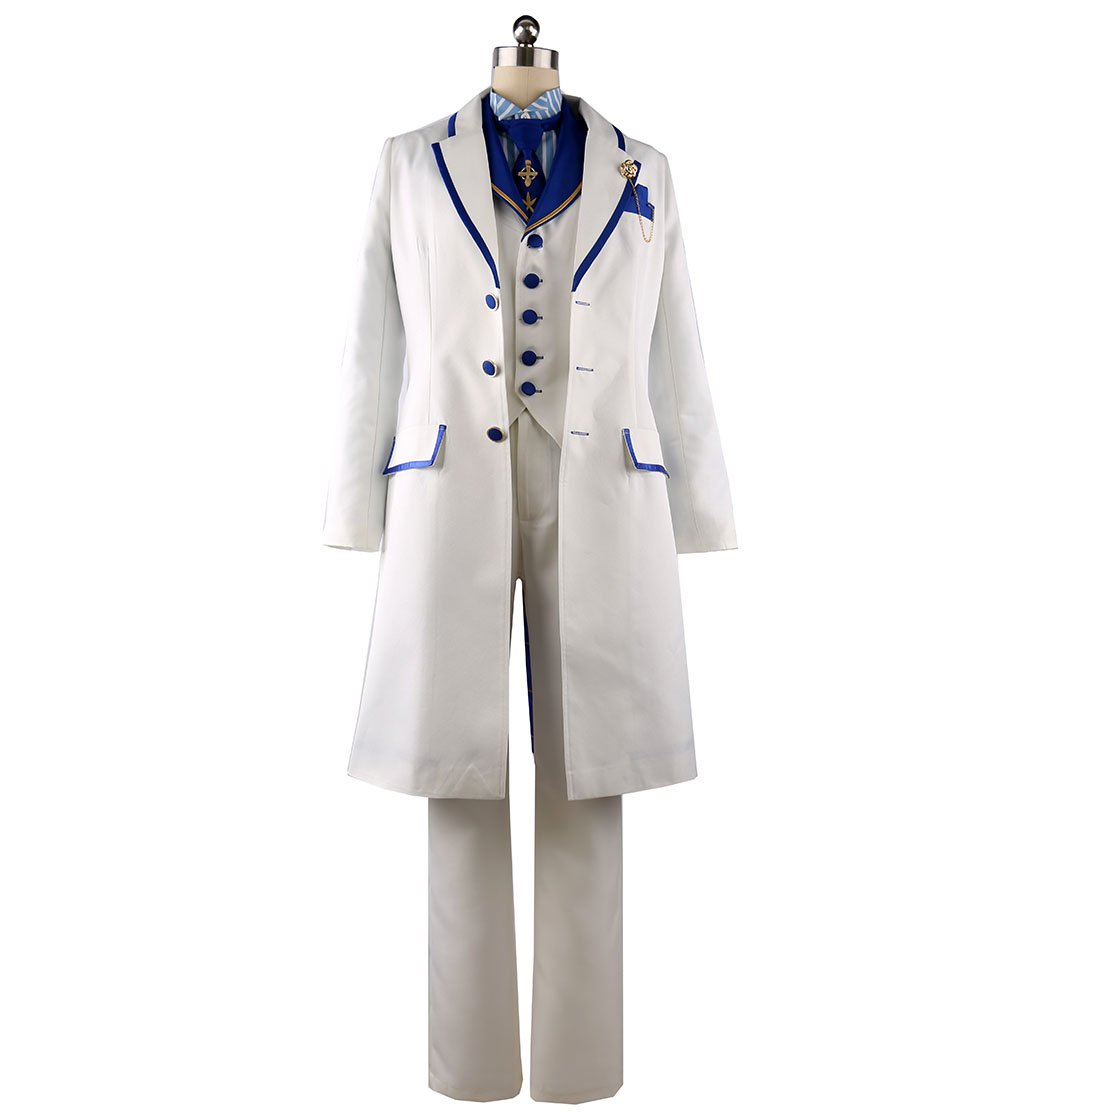 cnstone コスプレ衣装 白亜の薔薇 ホワイトローズ アーサーペンドラゴン 風 コスプレ服 コスチューム イベント パーティー 変装 仮装 (女性S) B07CHHYC44  女性XL 女性XL